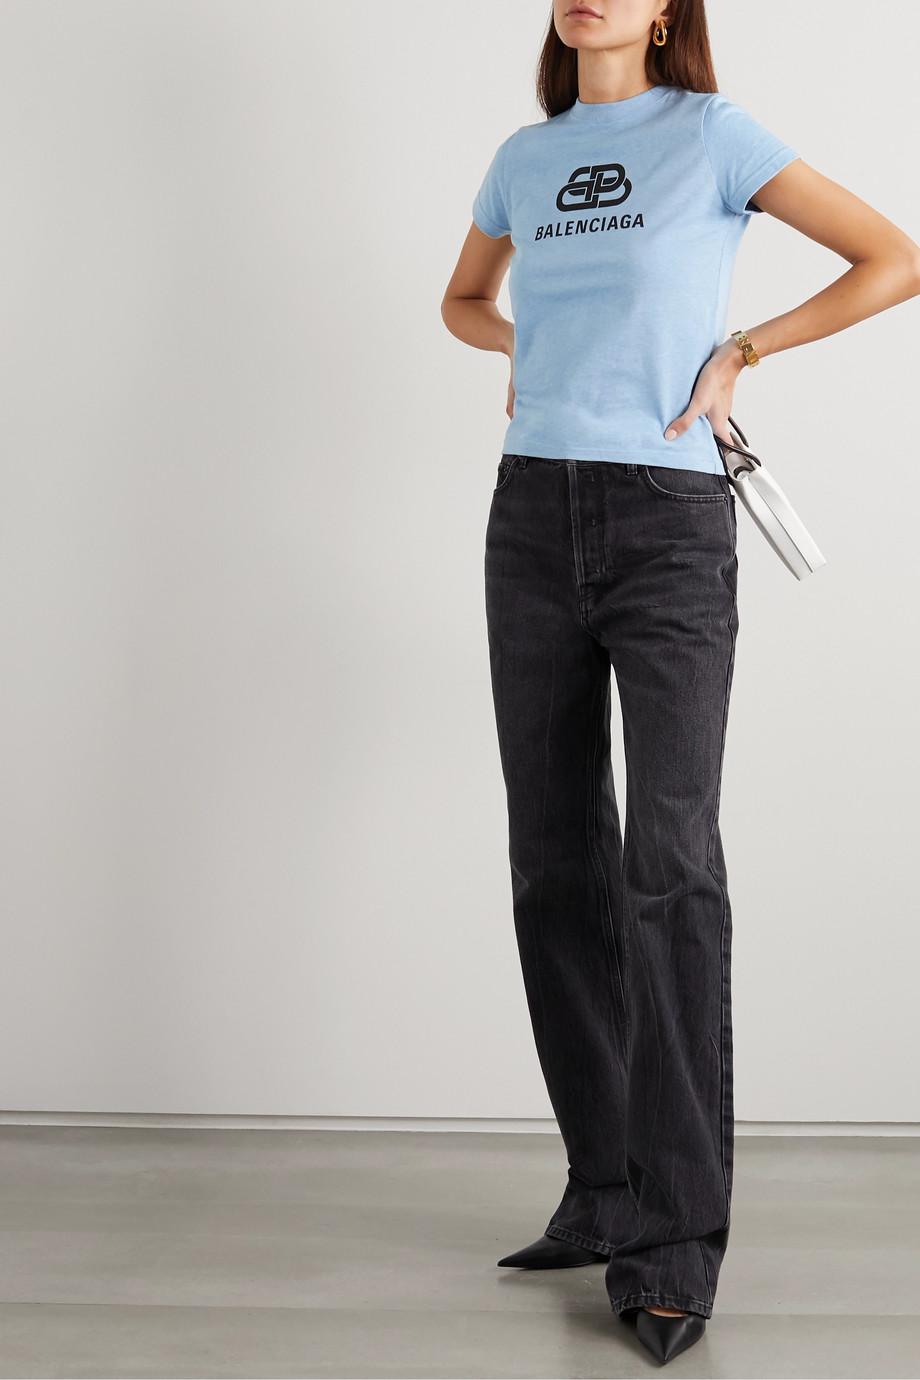 Balenciaga Cropped printed cotton-jersey T-shirt